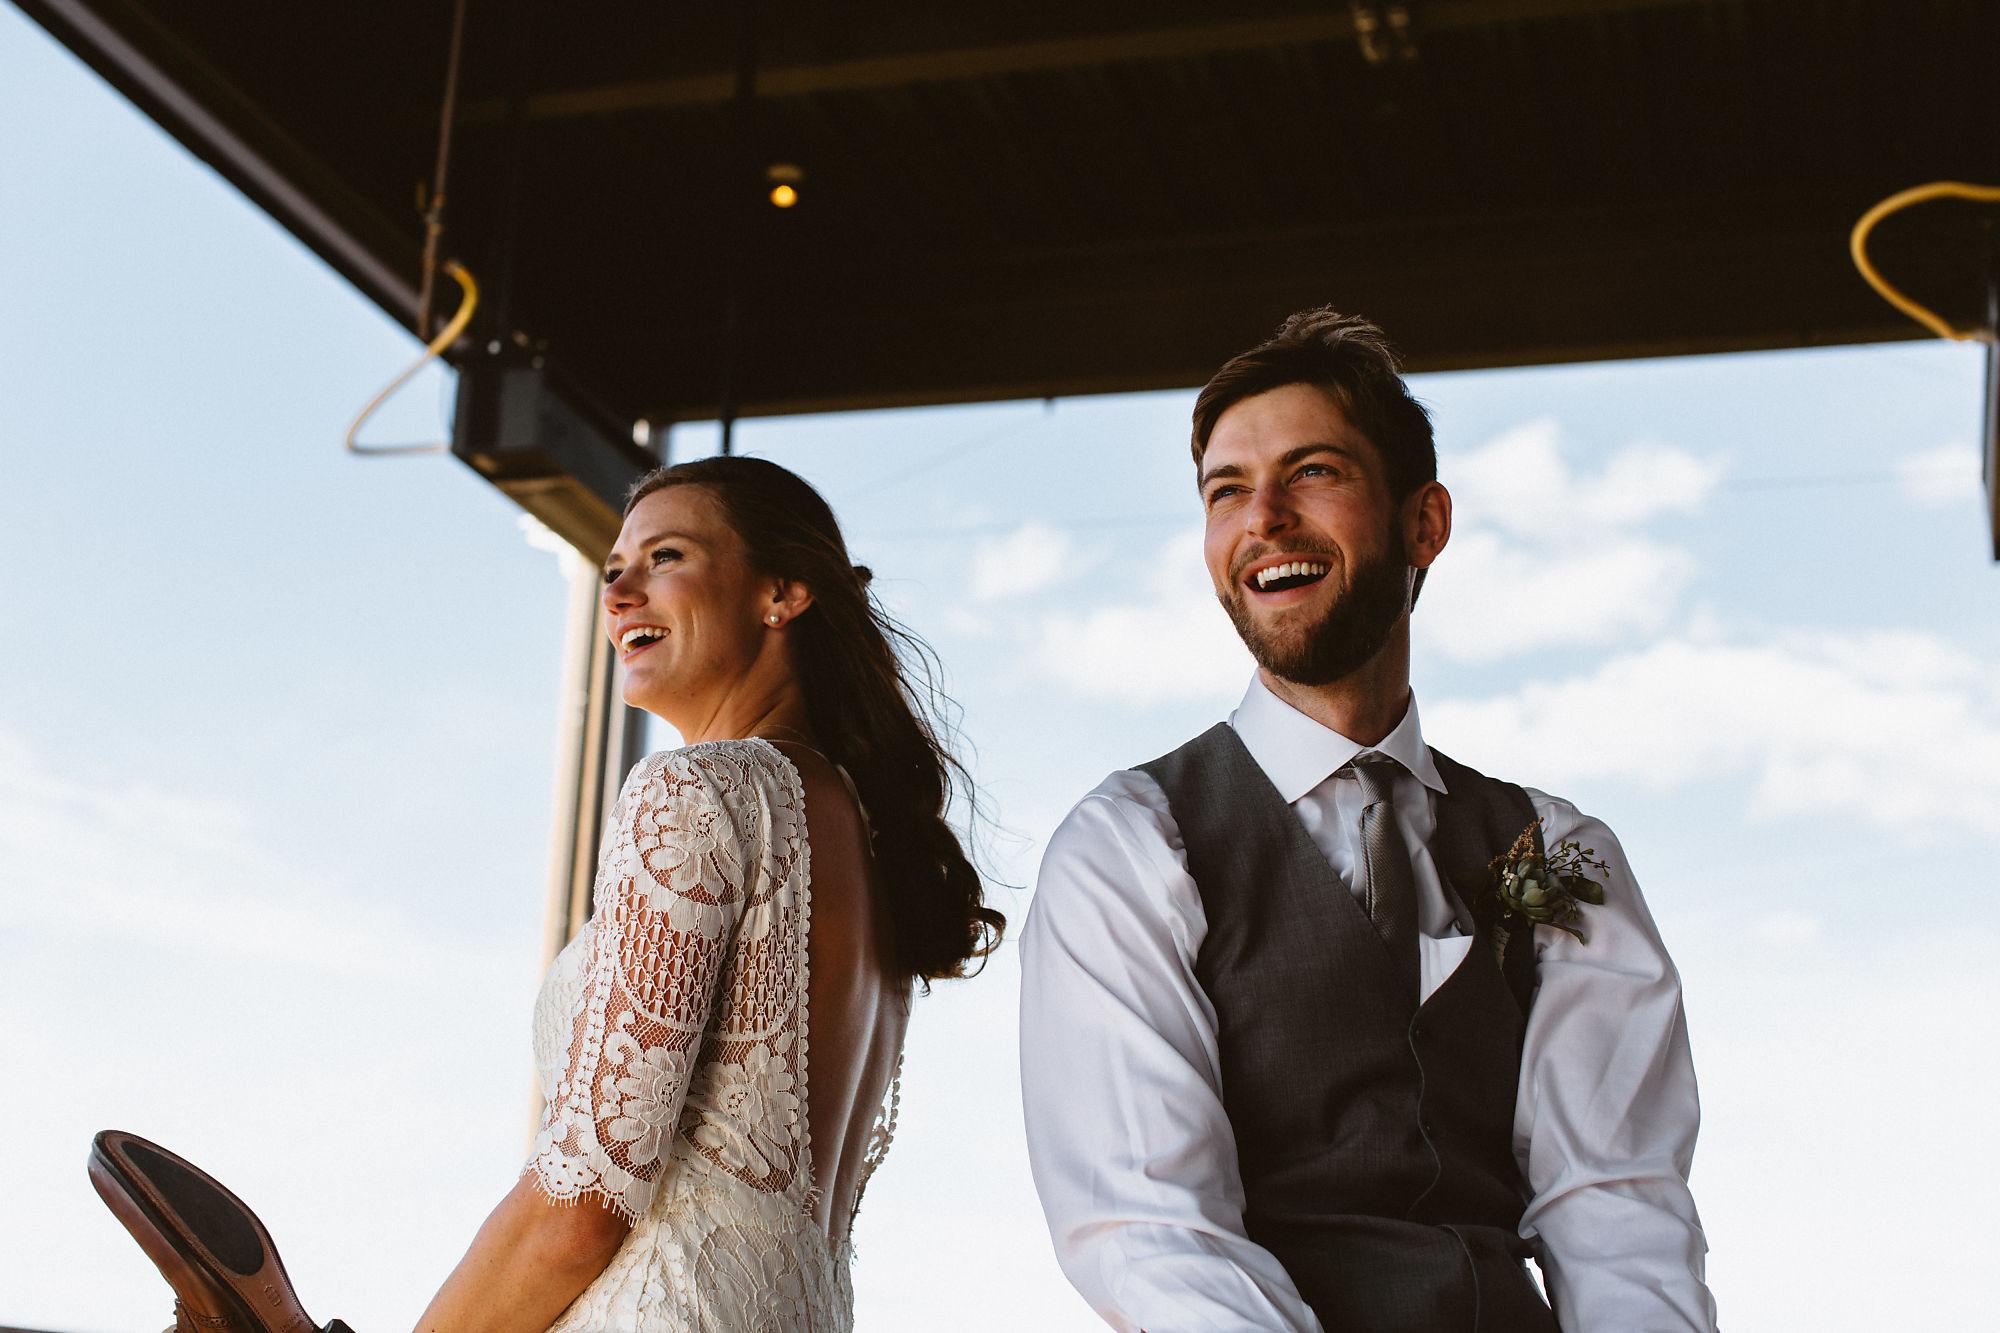 jessica_austin_oasis_brewery_wedding_photos161348.jpg